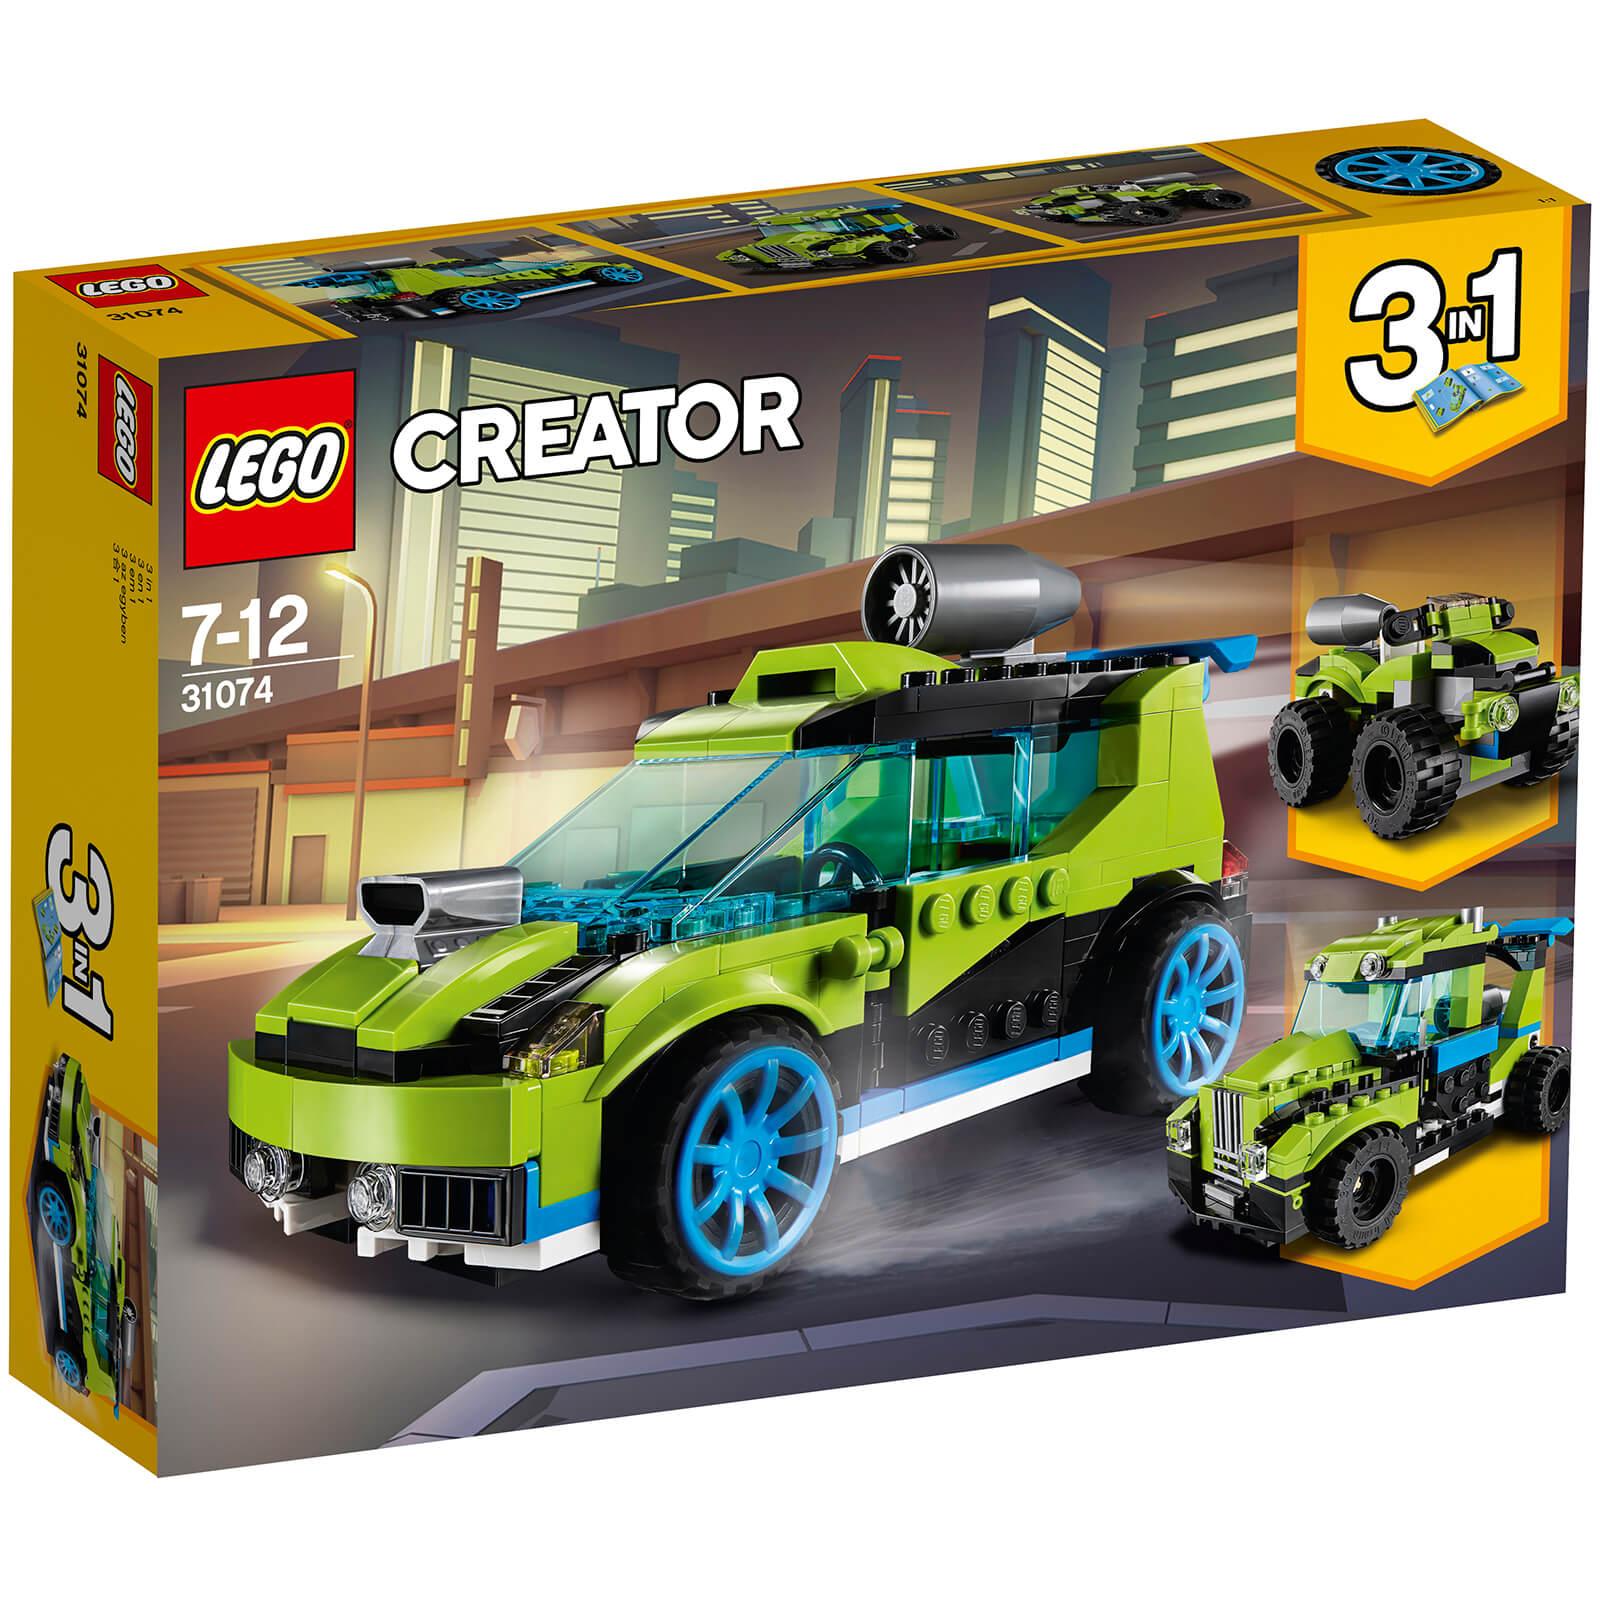 Lego Creator: Rocket Rally Car (31074)